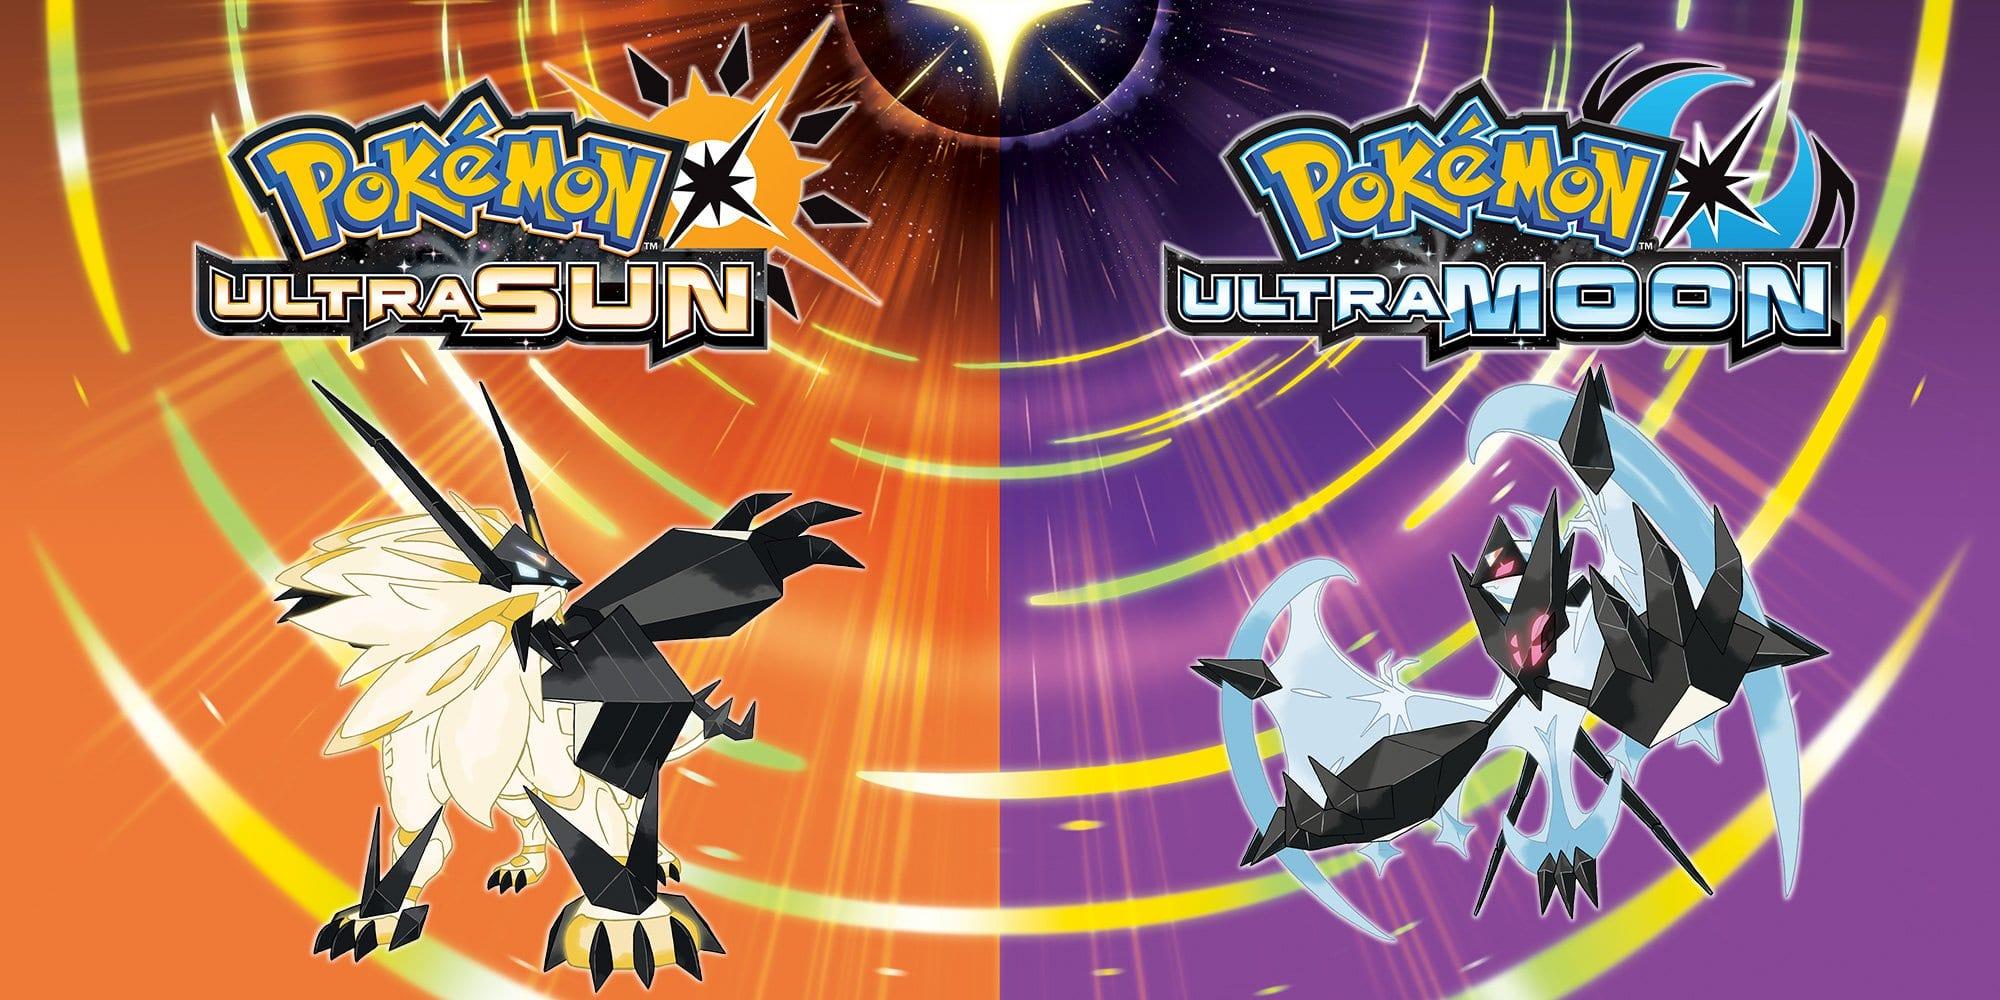 New Pokémon Ultra Sun and Ultra Moon Trailer Shows Rainbow Rocket